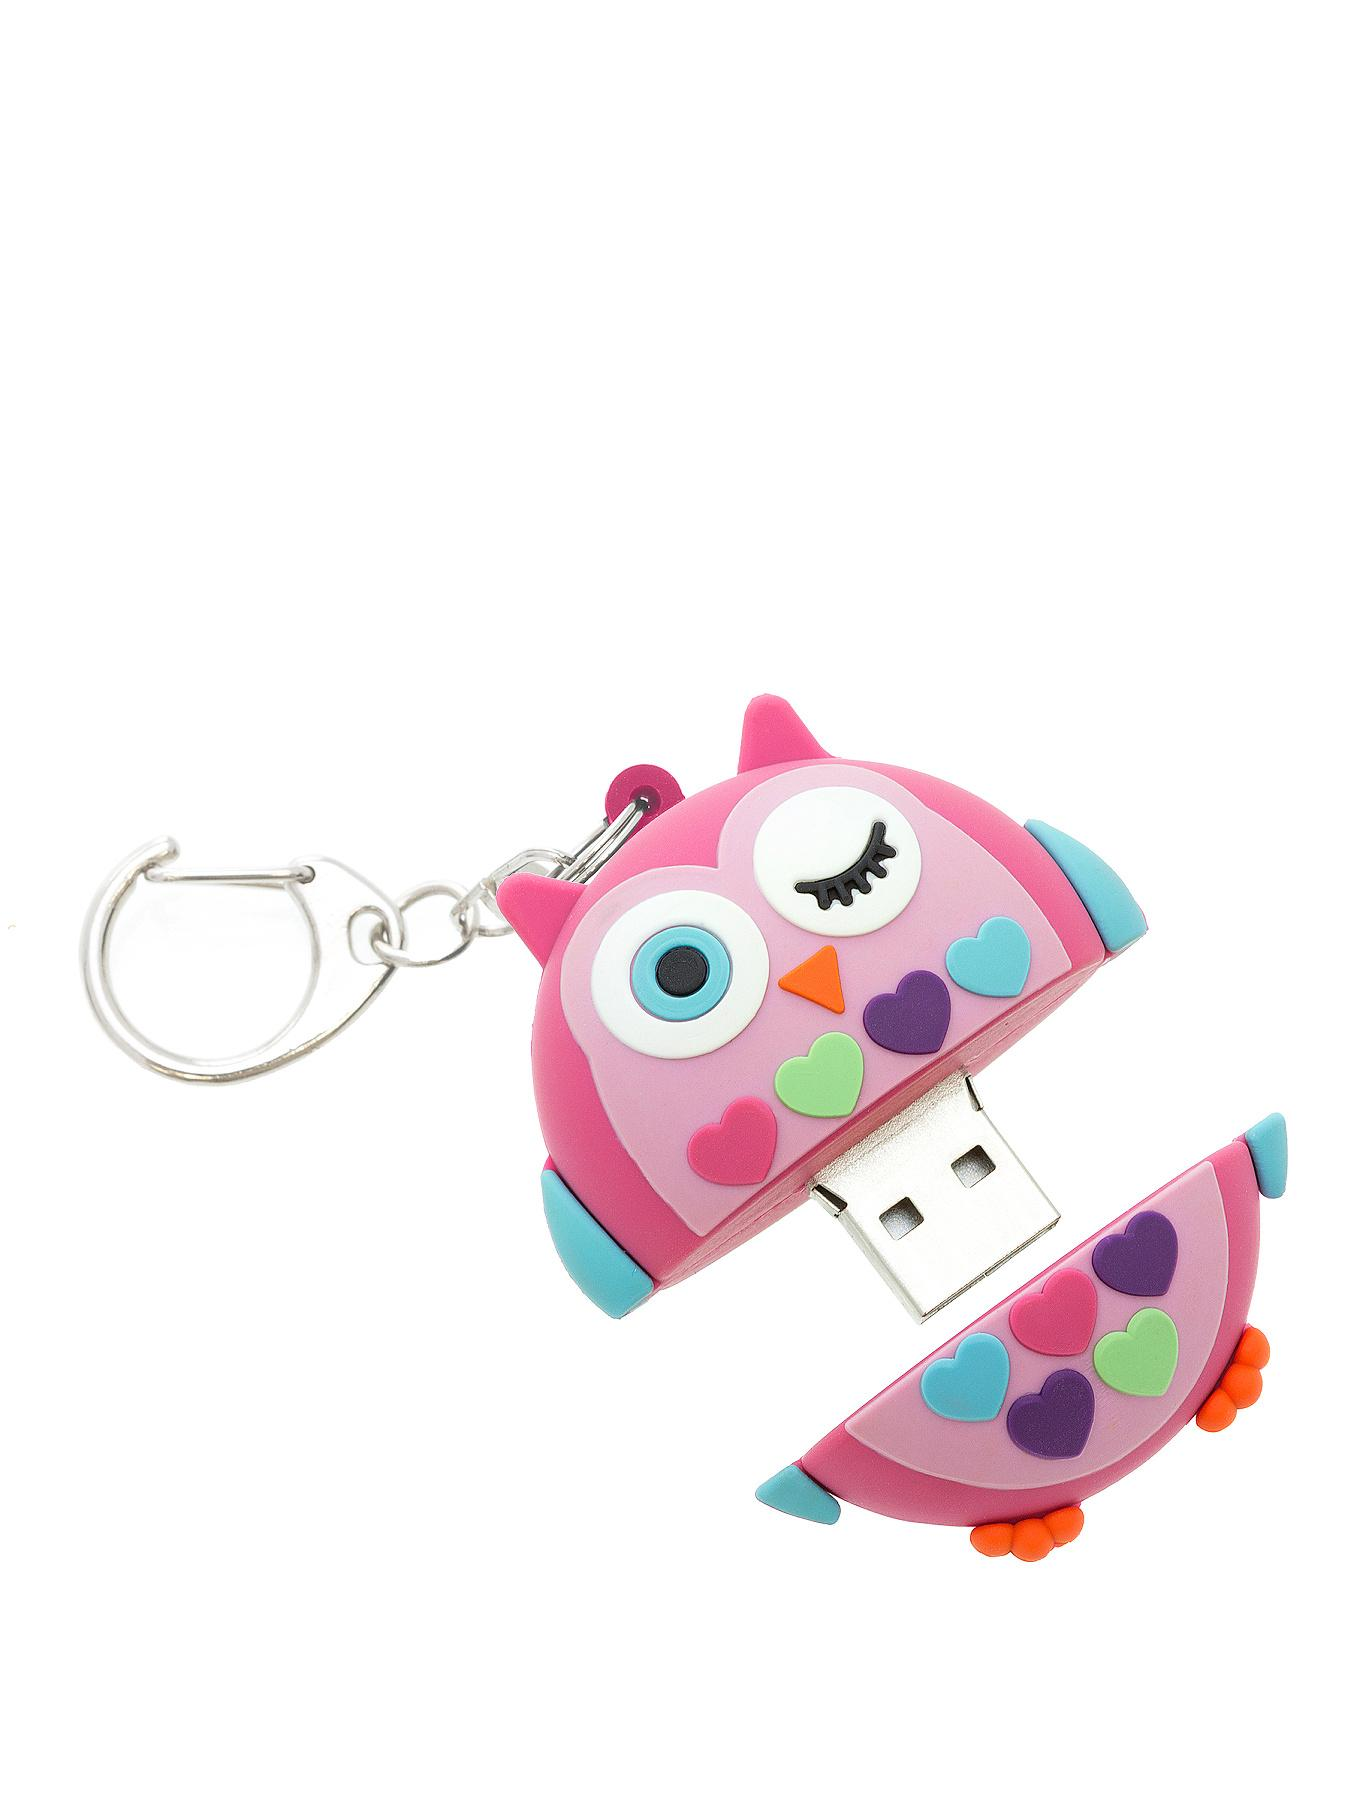 Trendz 8Gb Character Owl USB Drive